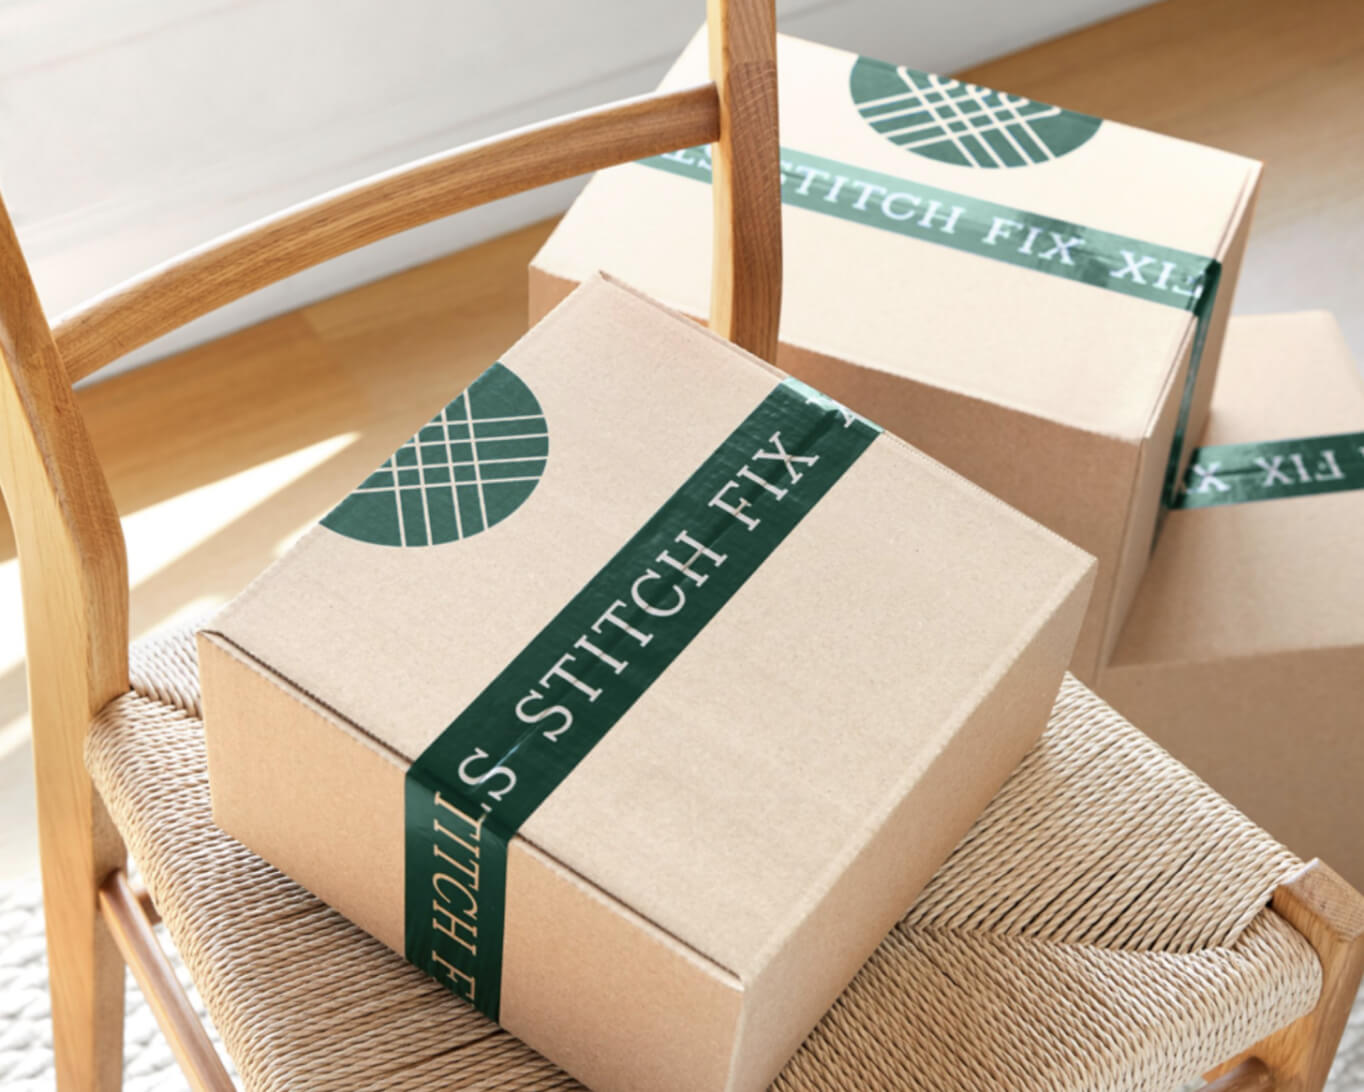 Stitch Fix boxes